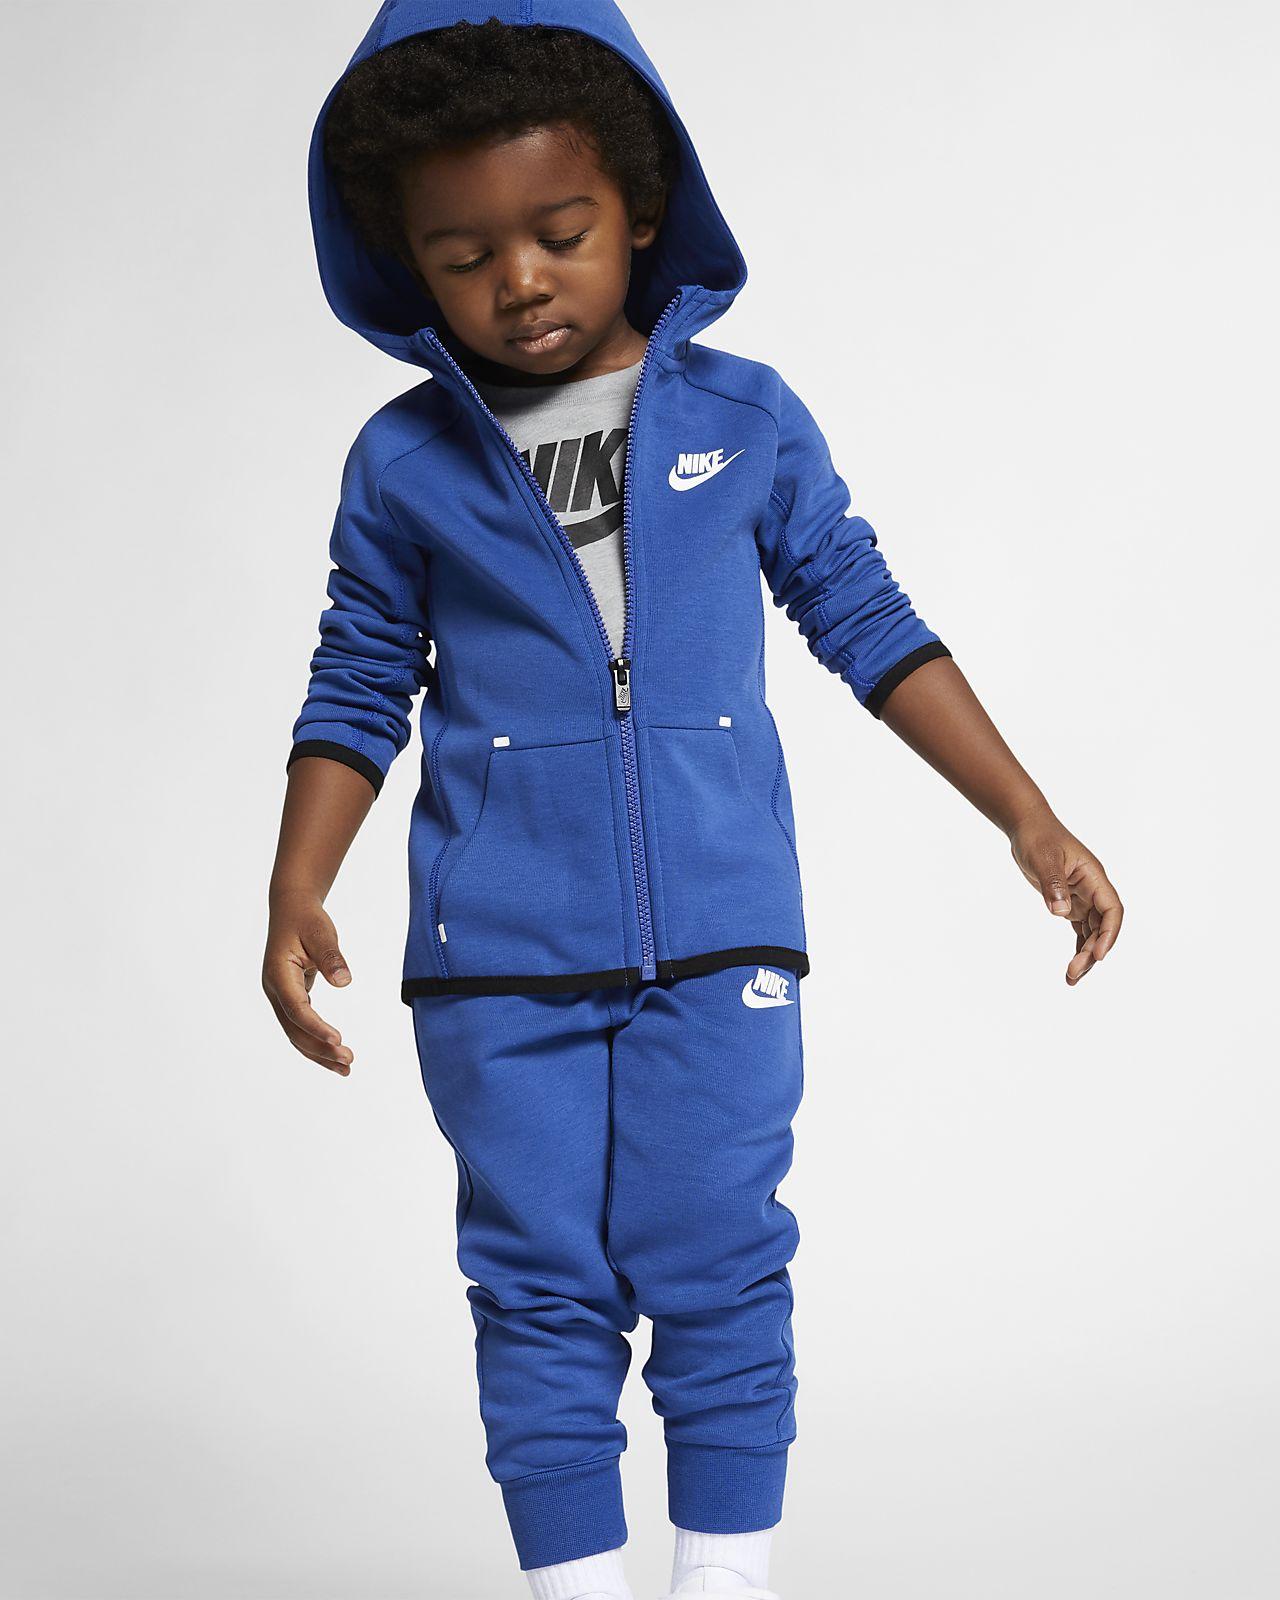 Completo in 2 pezzi Nike Sportswear Tech Fleece - Bimbi piccoli